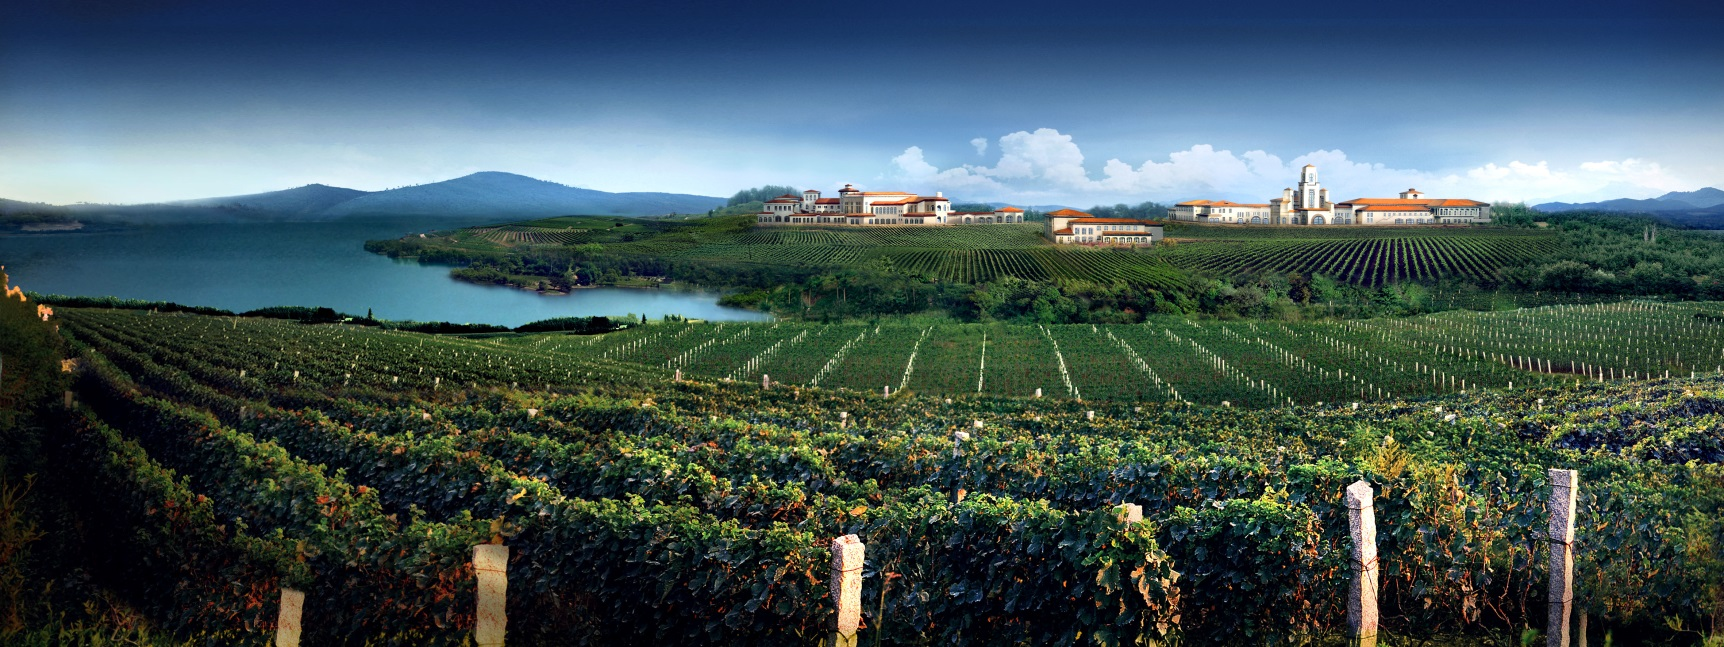 Chateau Junding Winery (Penglai, Shandong province)